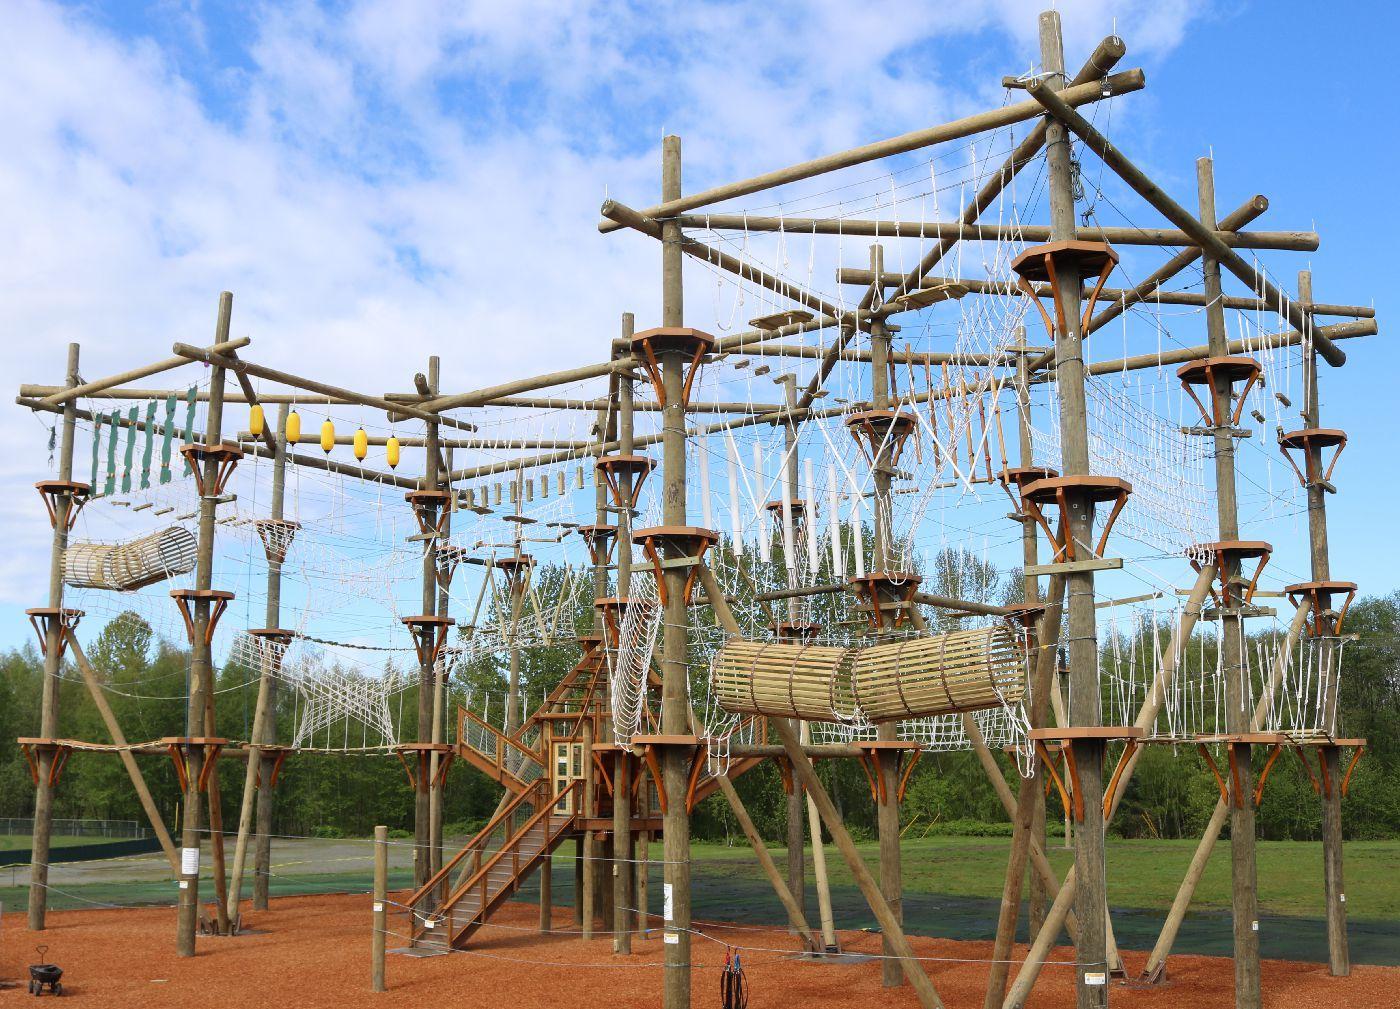 High Trek Adventures Ropes Course Zipline For Ages 4 104 Ziplining Ropes Course Adventure Park